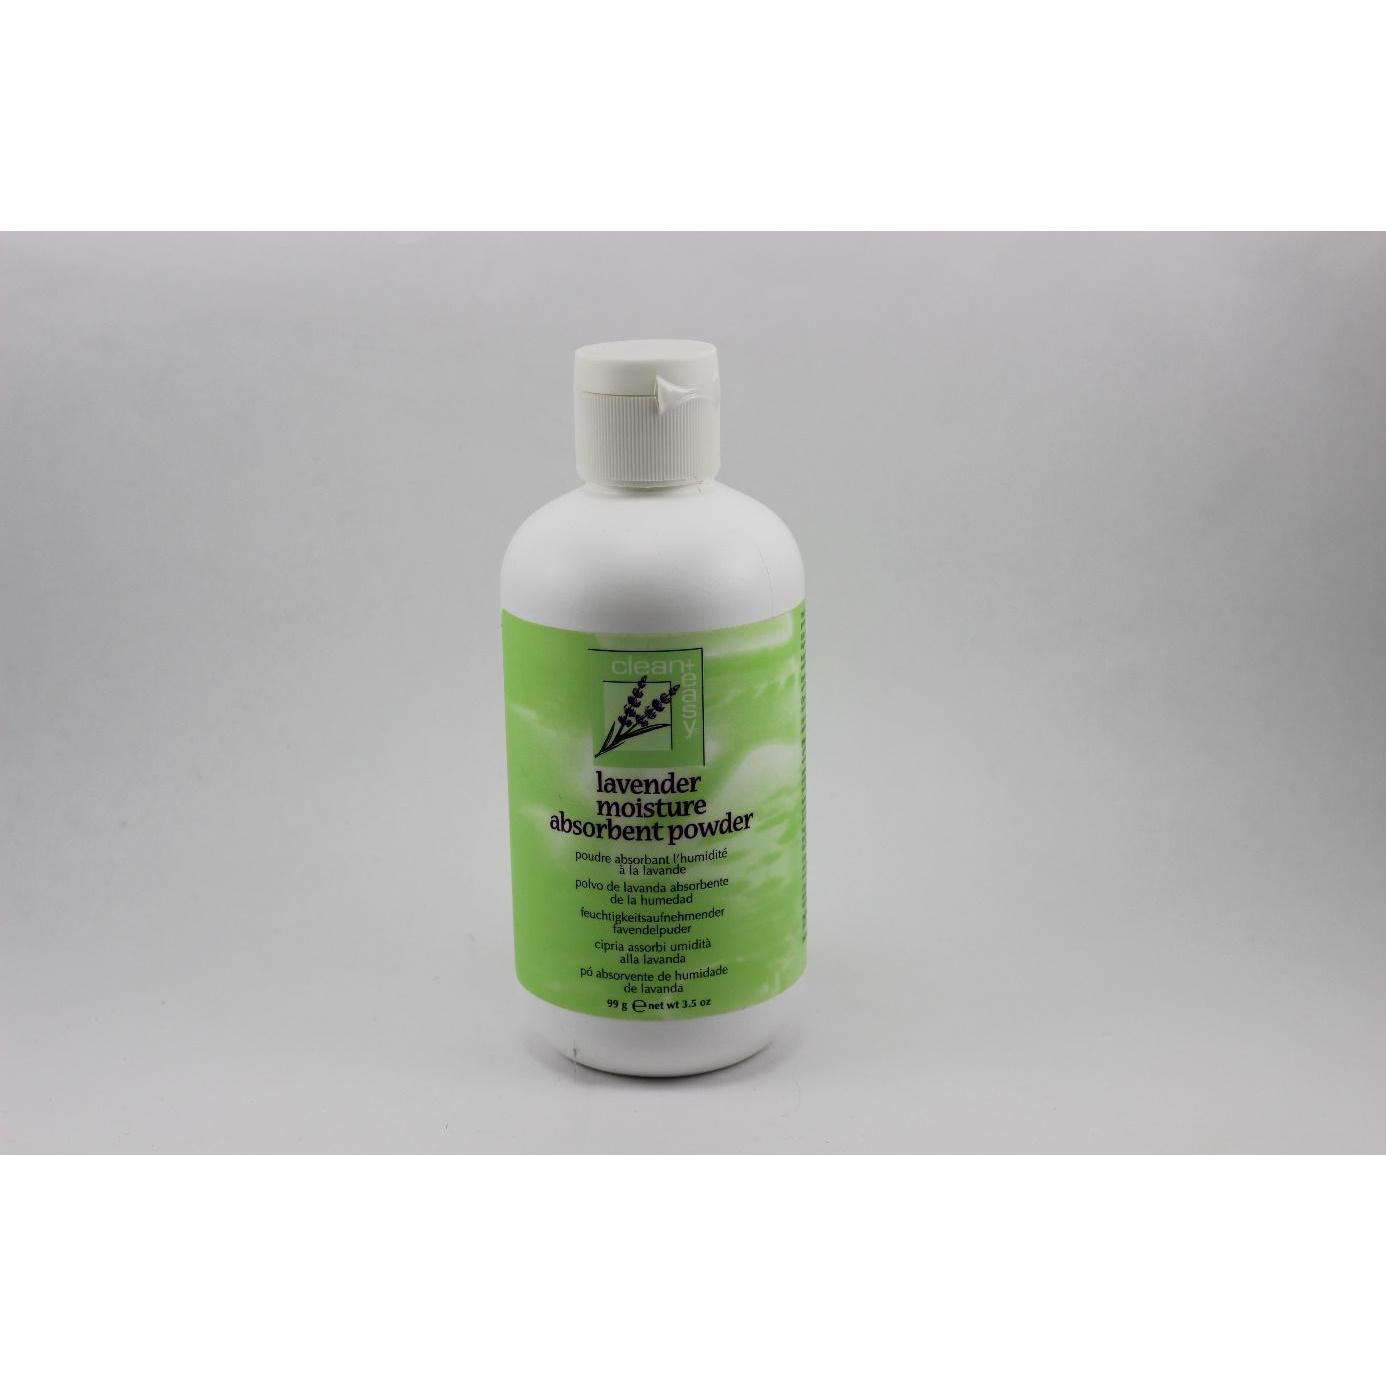 Lavender moisture absorbent powder